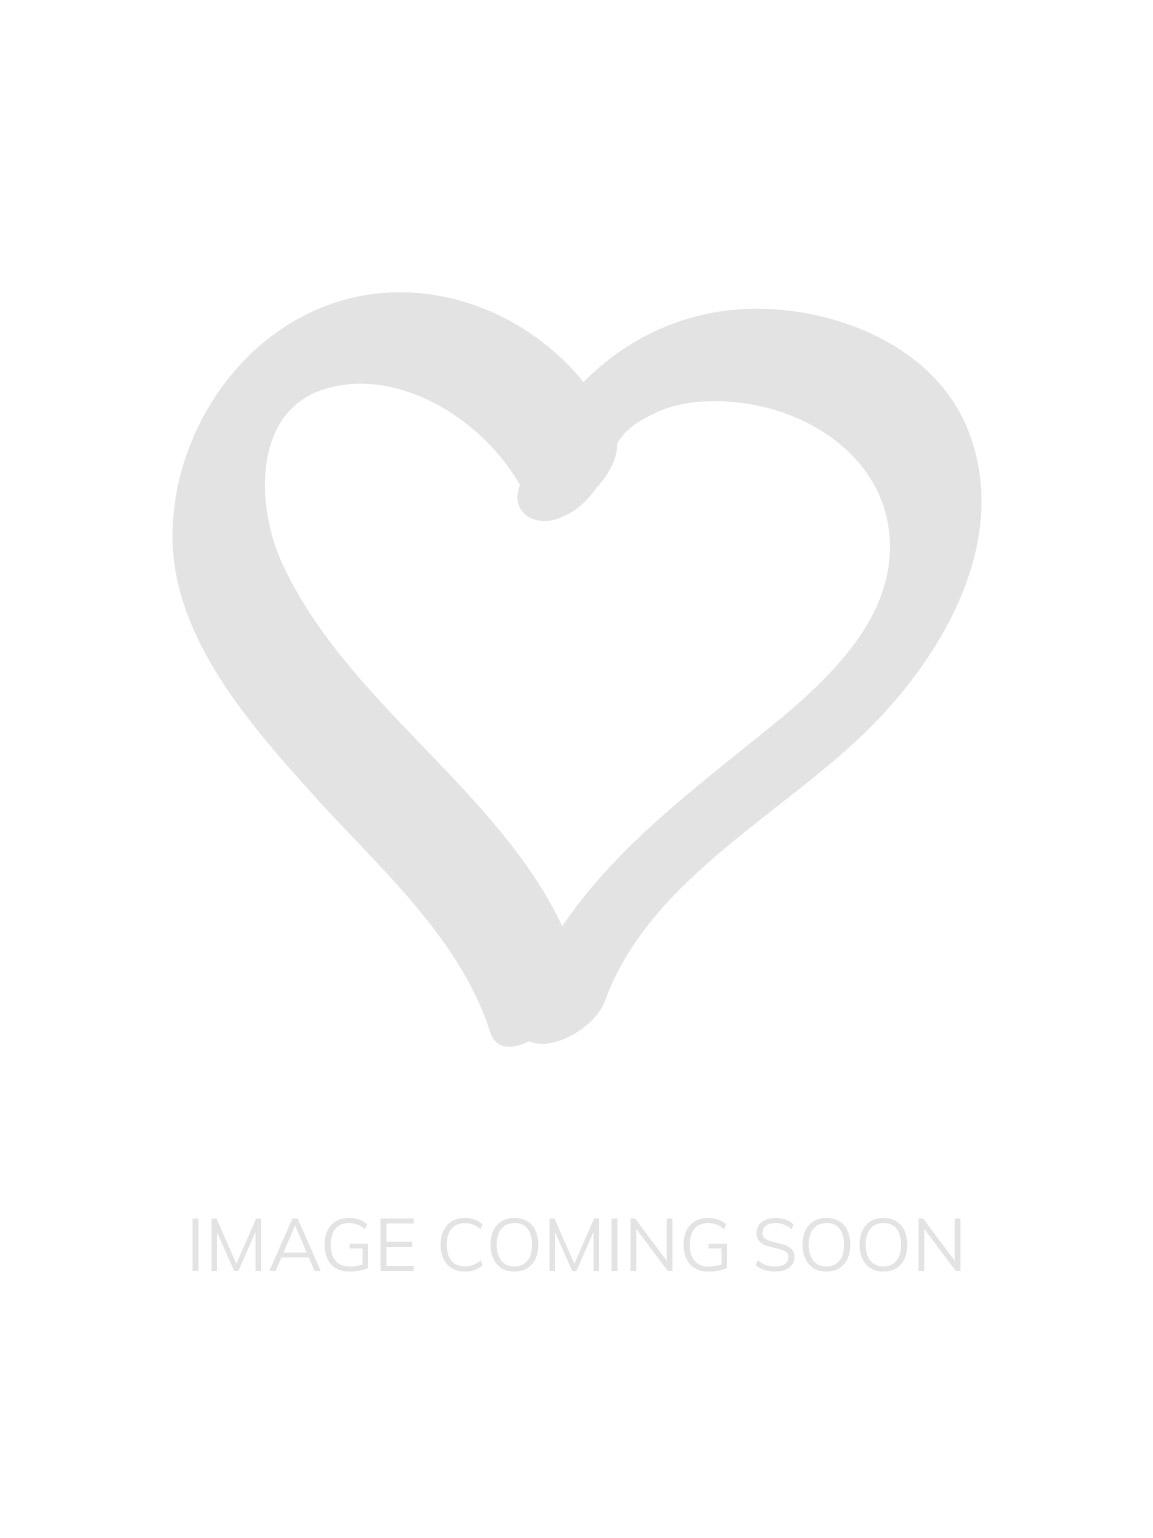 712a37a1f68 Sabine Balcony Bra - Lavender Lustre Adobe Rose